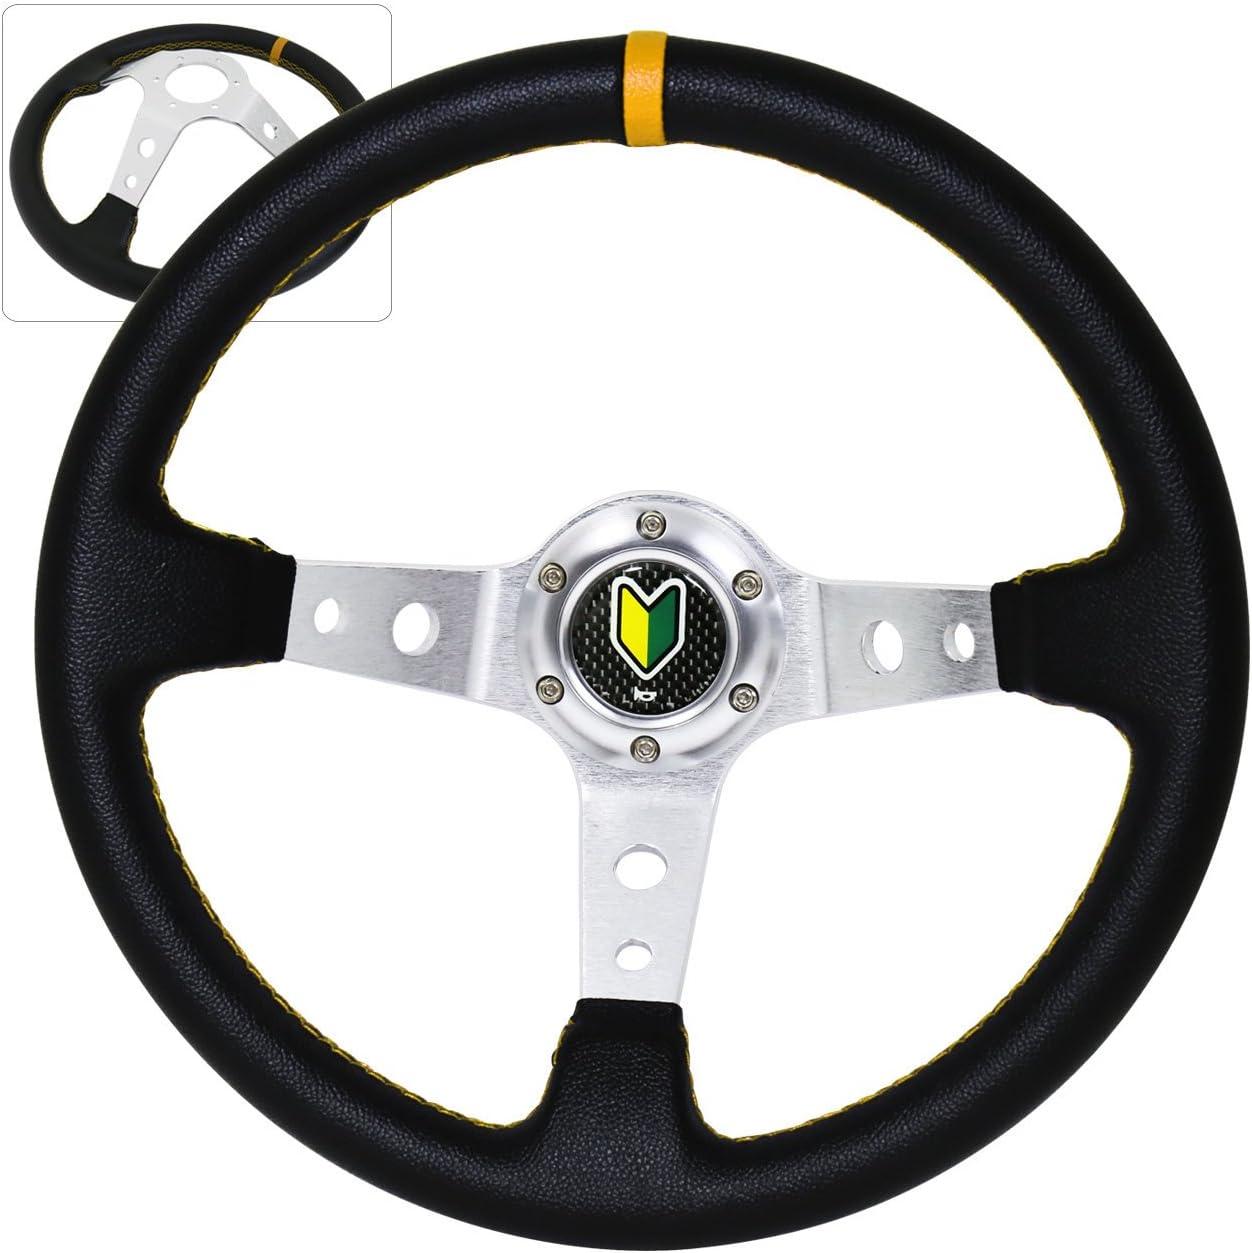 Universal 350MM 6 Bolt Hole Heavy Duty Deep Dish Light Weight Steering Wheel Green Trim Gold Center Streak Design Wakaba JDM Leaf Horn Button